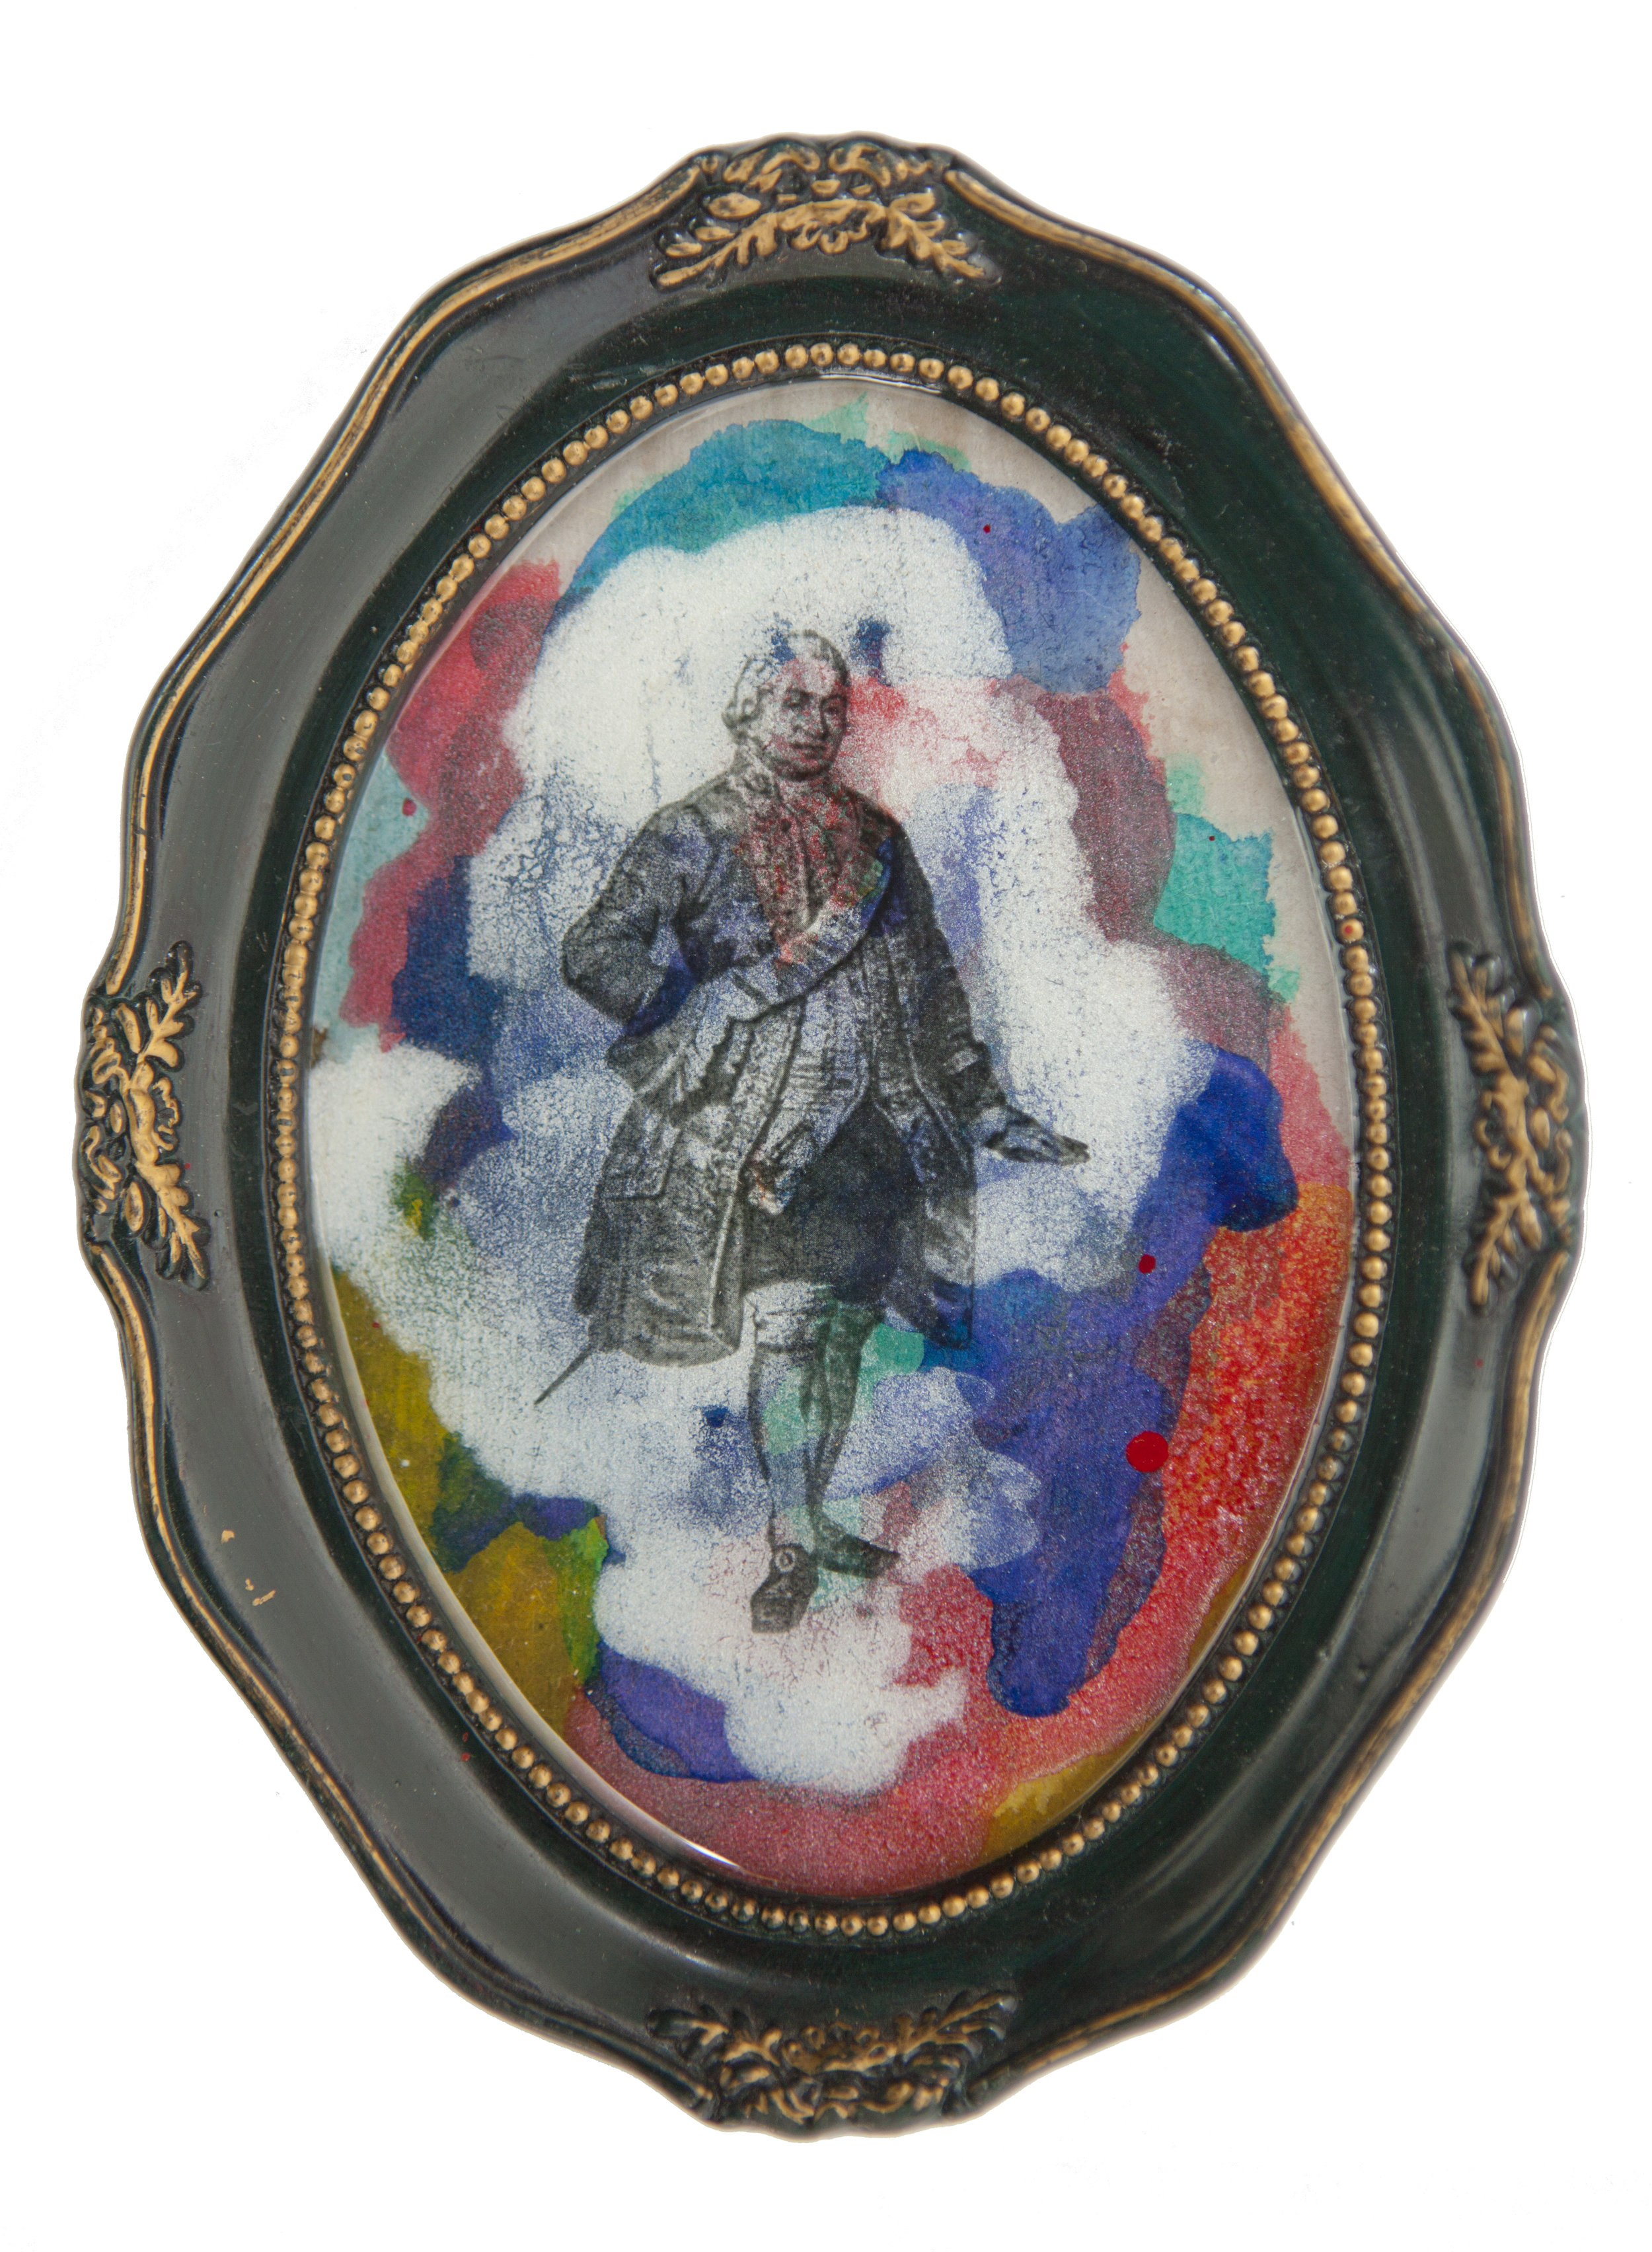 Shiraz Bayjoo    Governor part 1    Acrylic on board, resin, wood  15 x 11.5 x 1.5 cm  2016